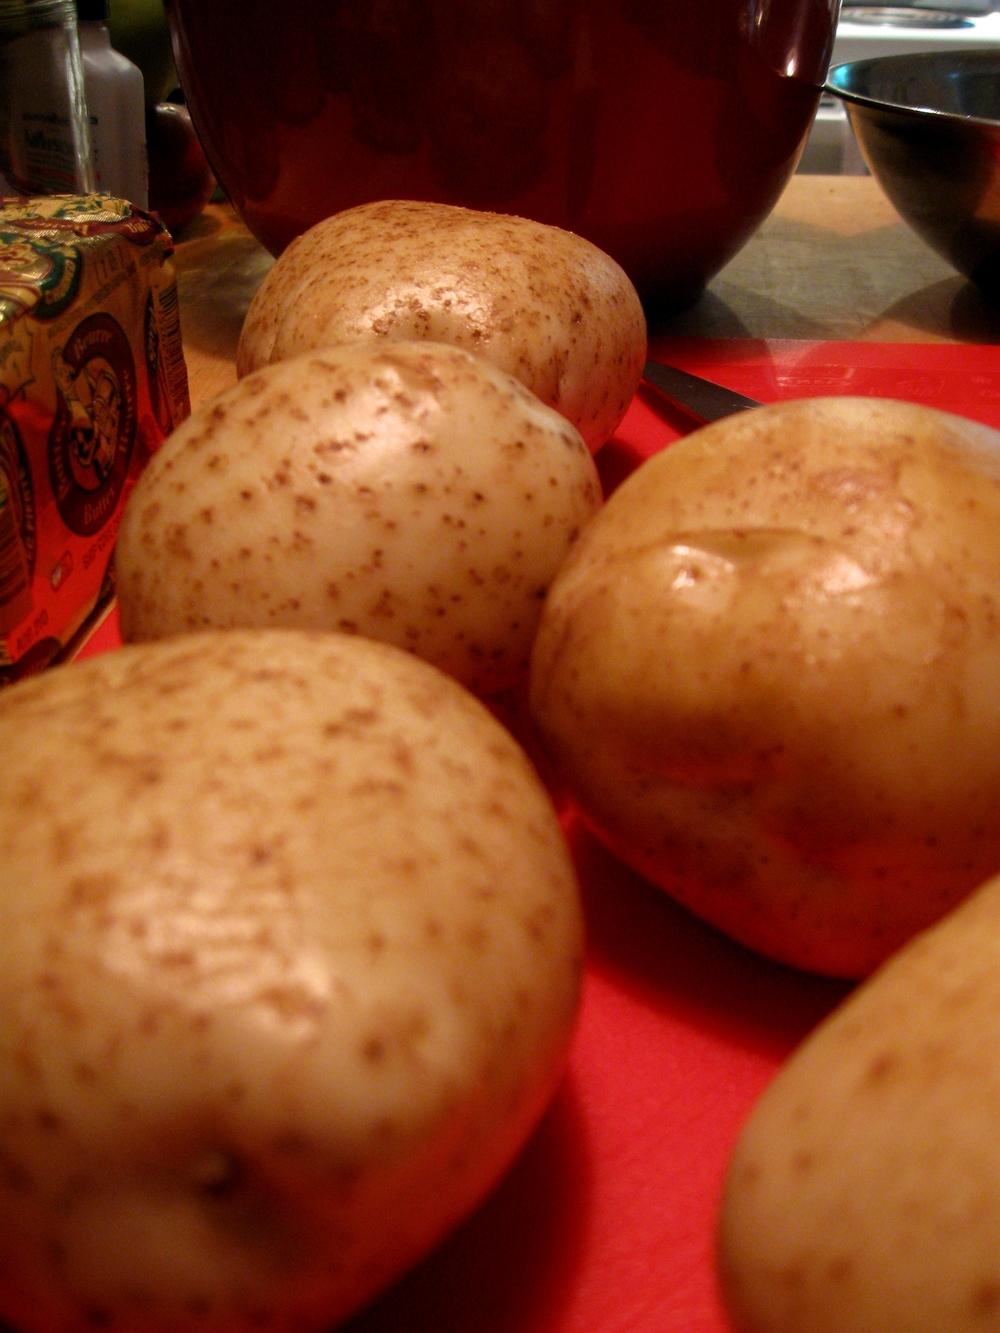 20120812-potato-01.jpg